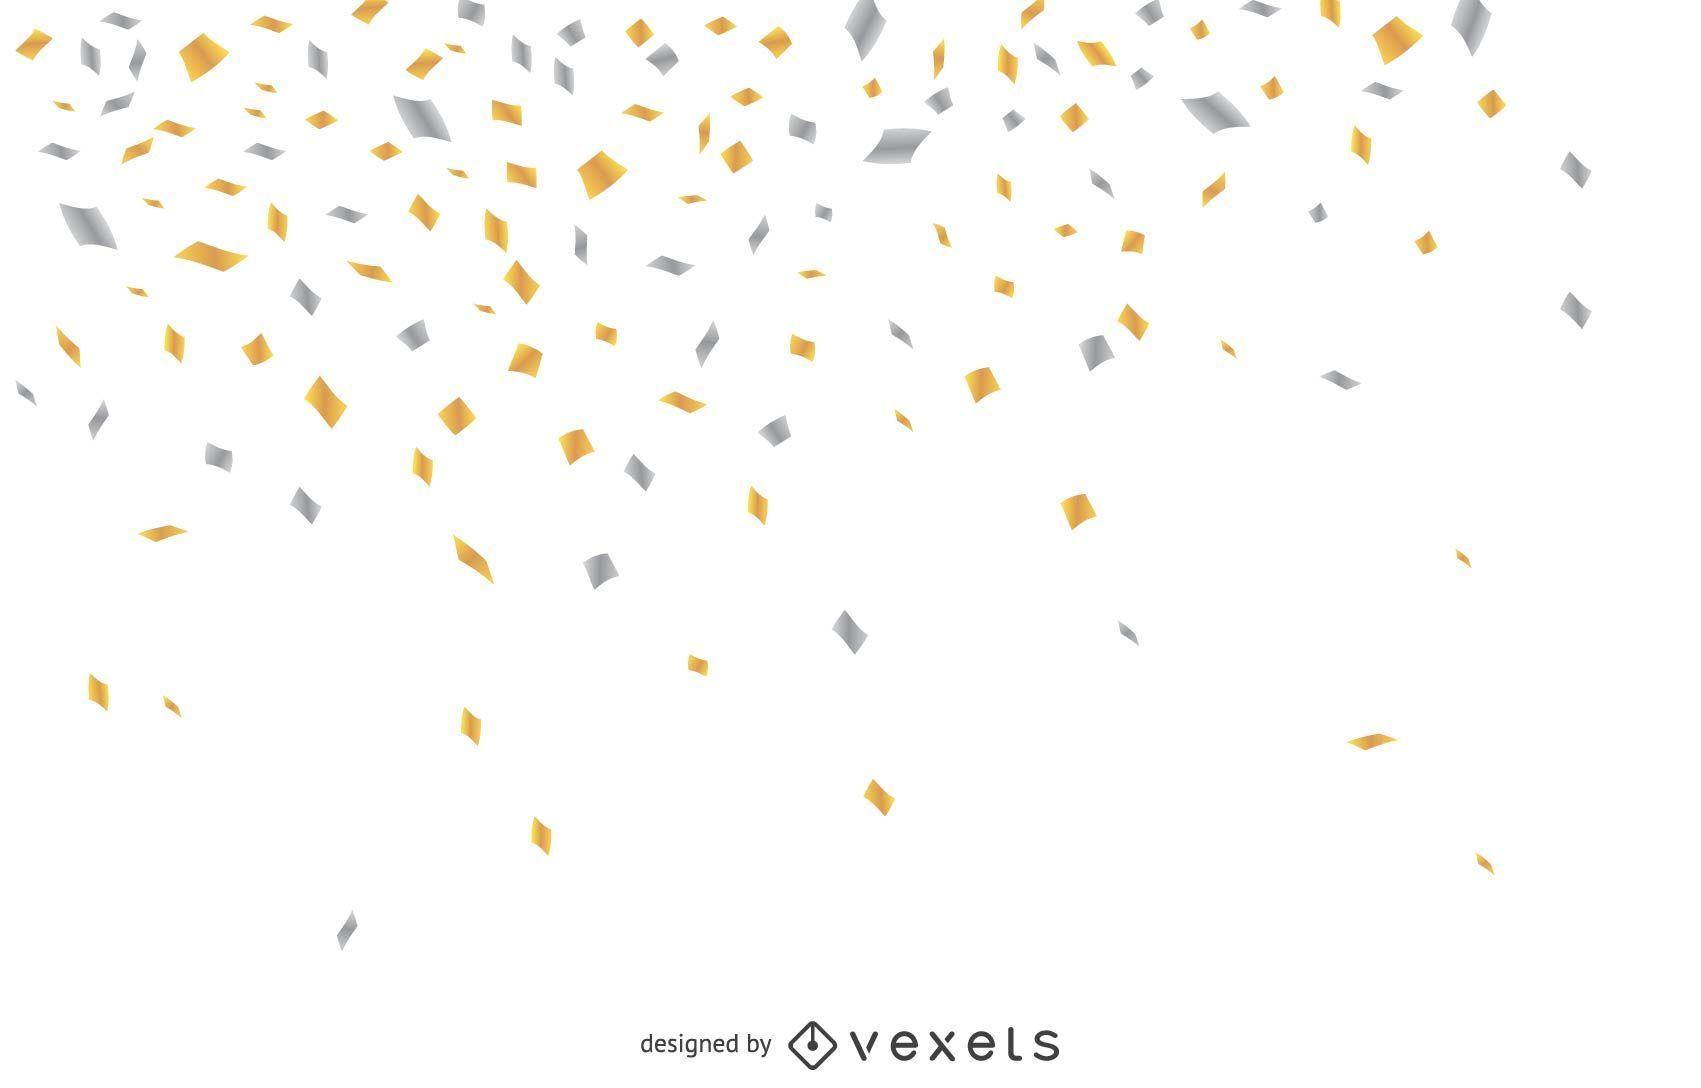 Confetti falling background